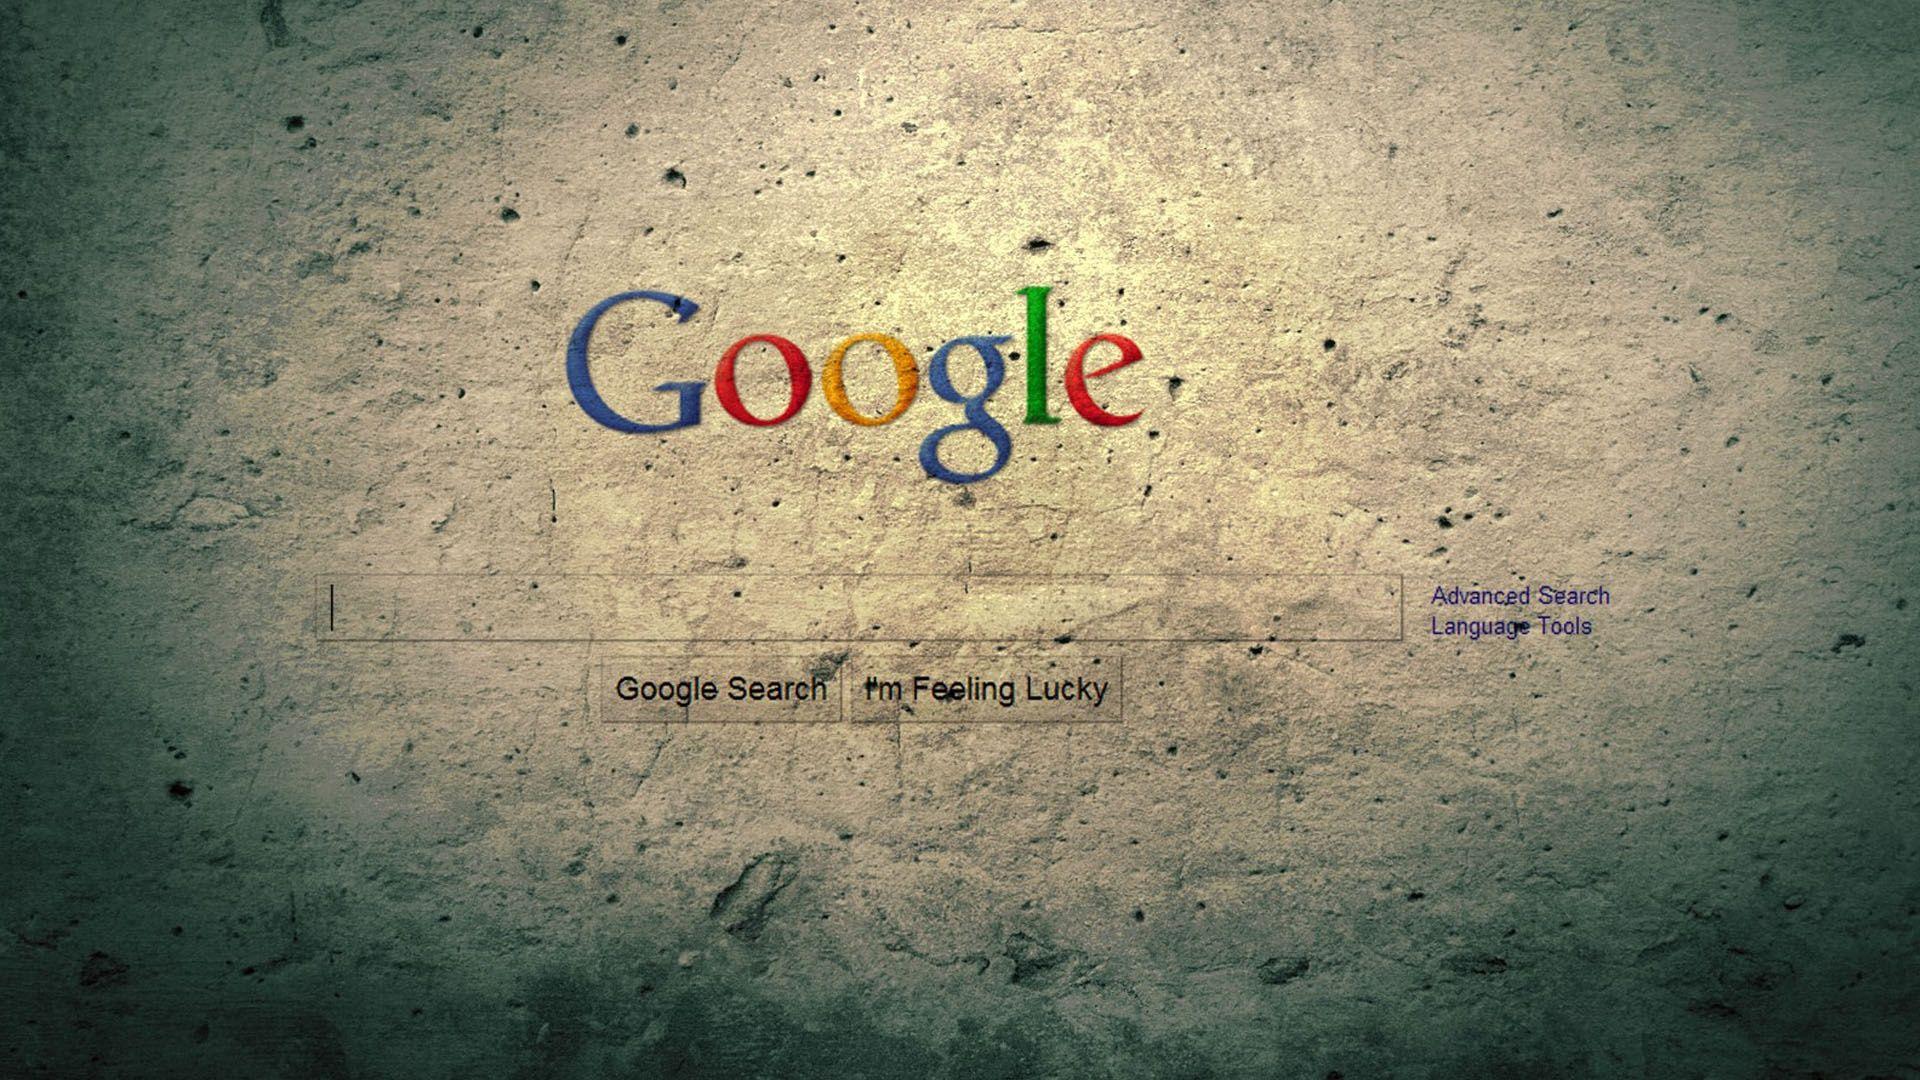 Grunge Google Hd Cool Wallpapers Full Hd Wallpaper Cool Desktop